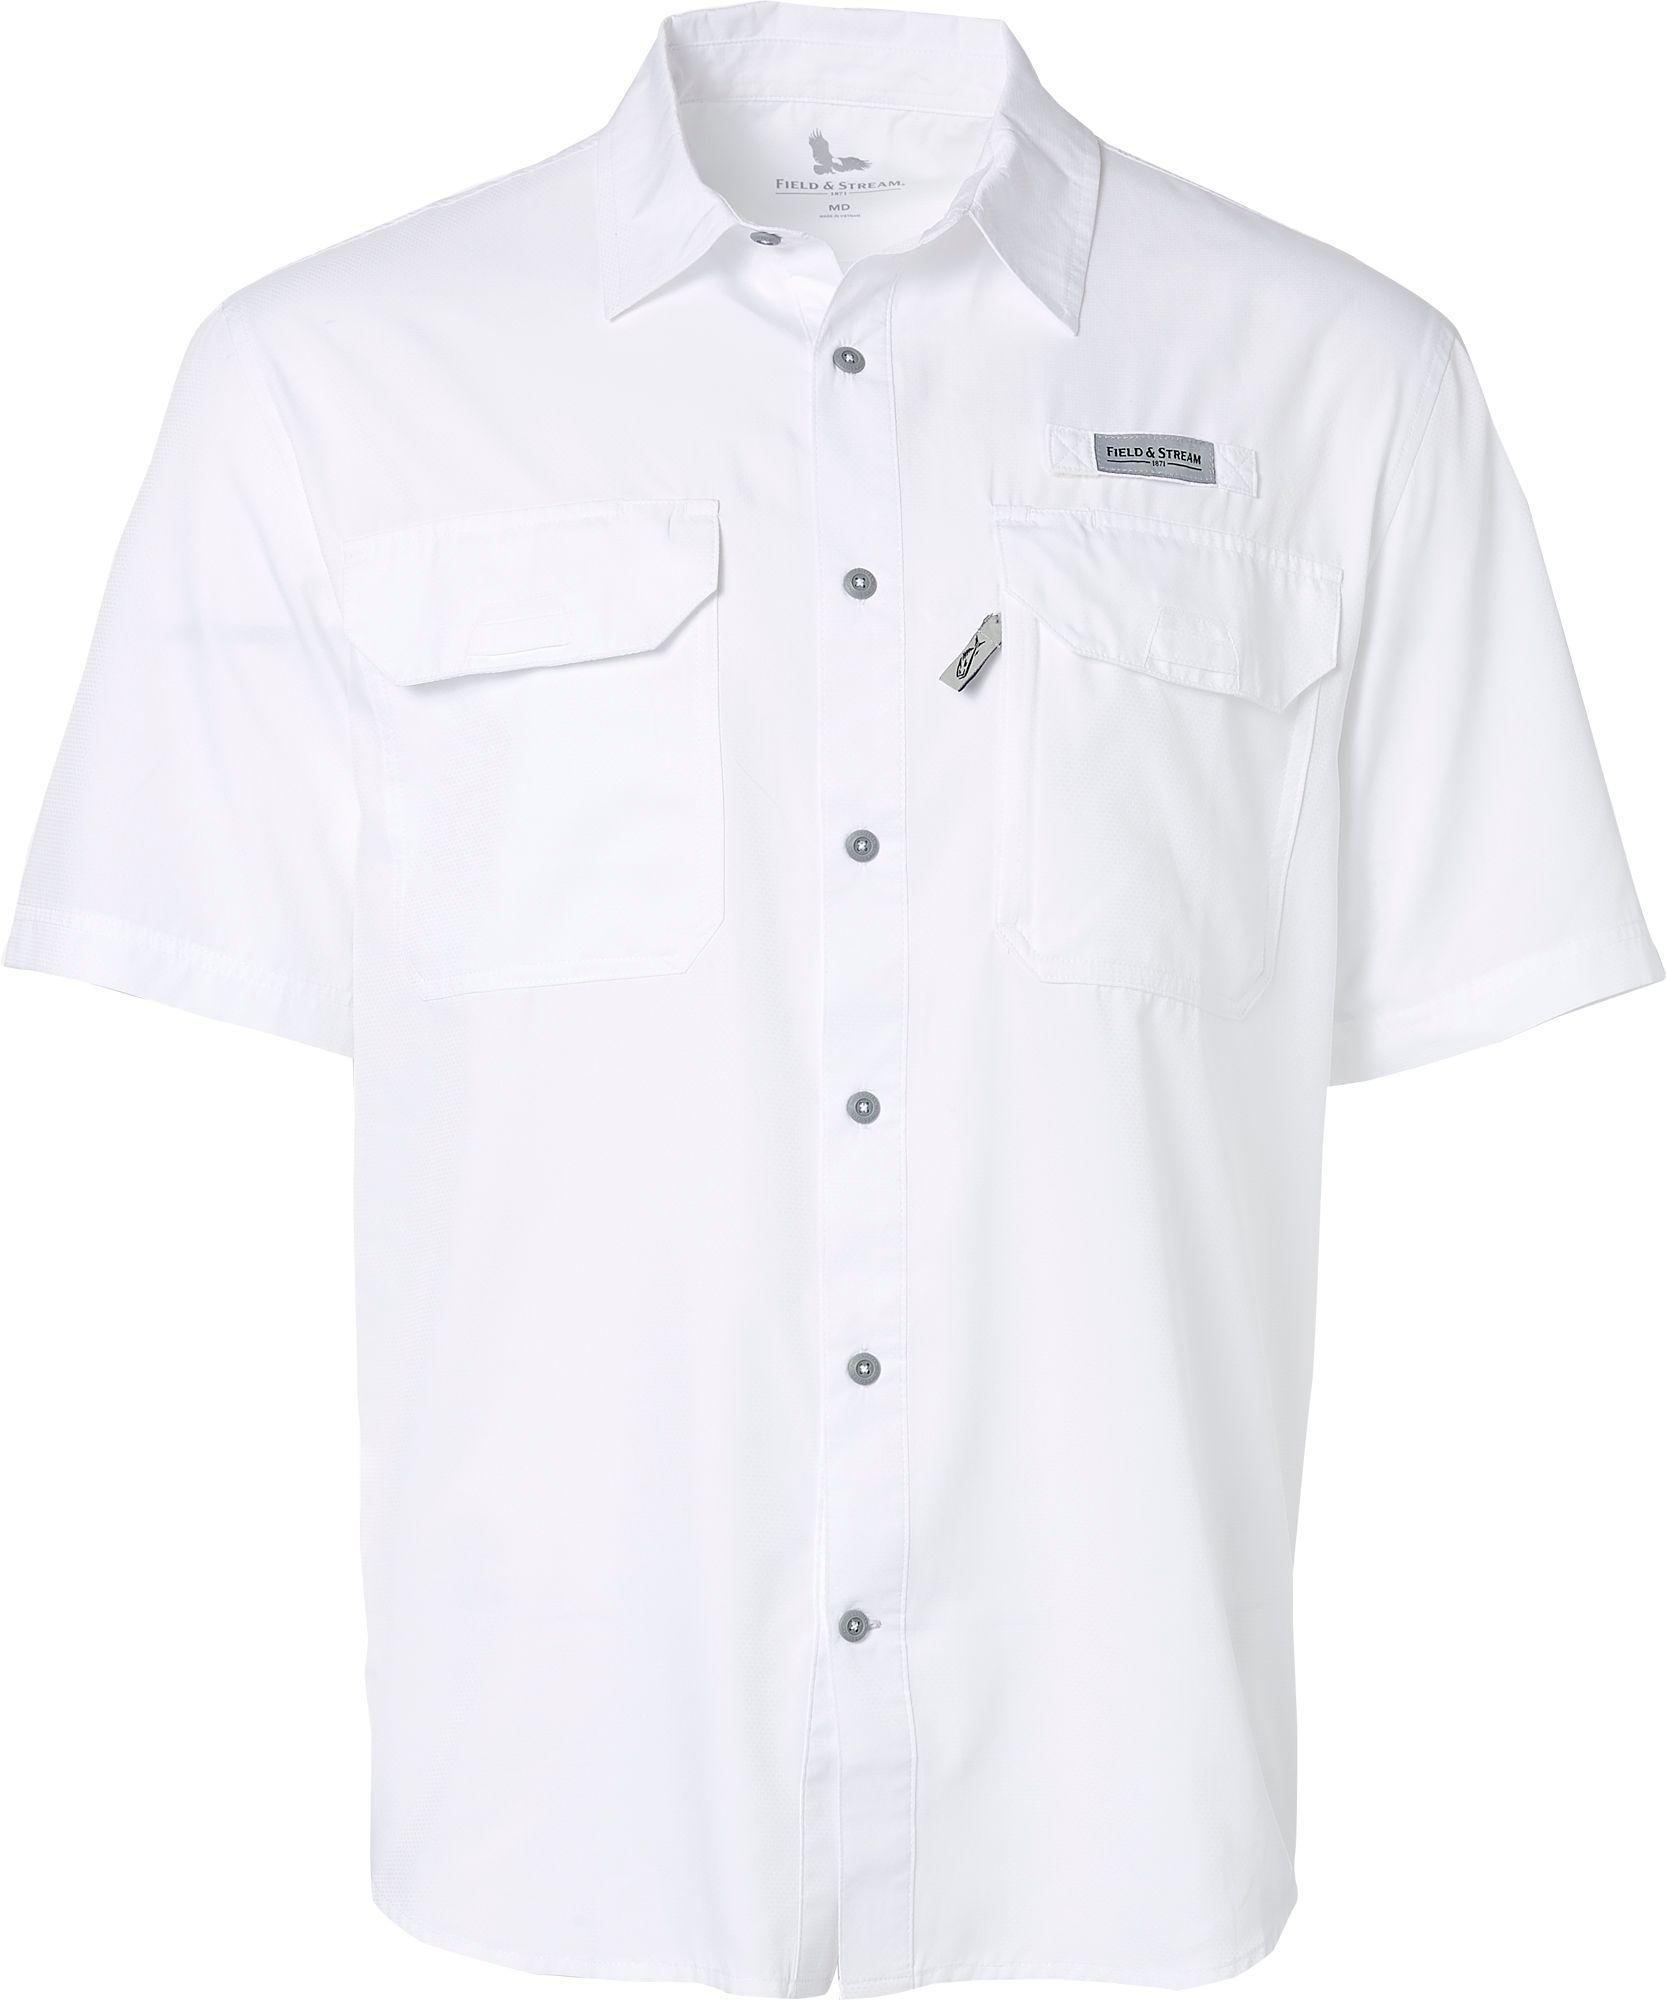 Field & Stream Men's 2017 Latitude Shirt